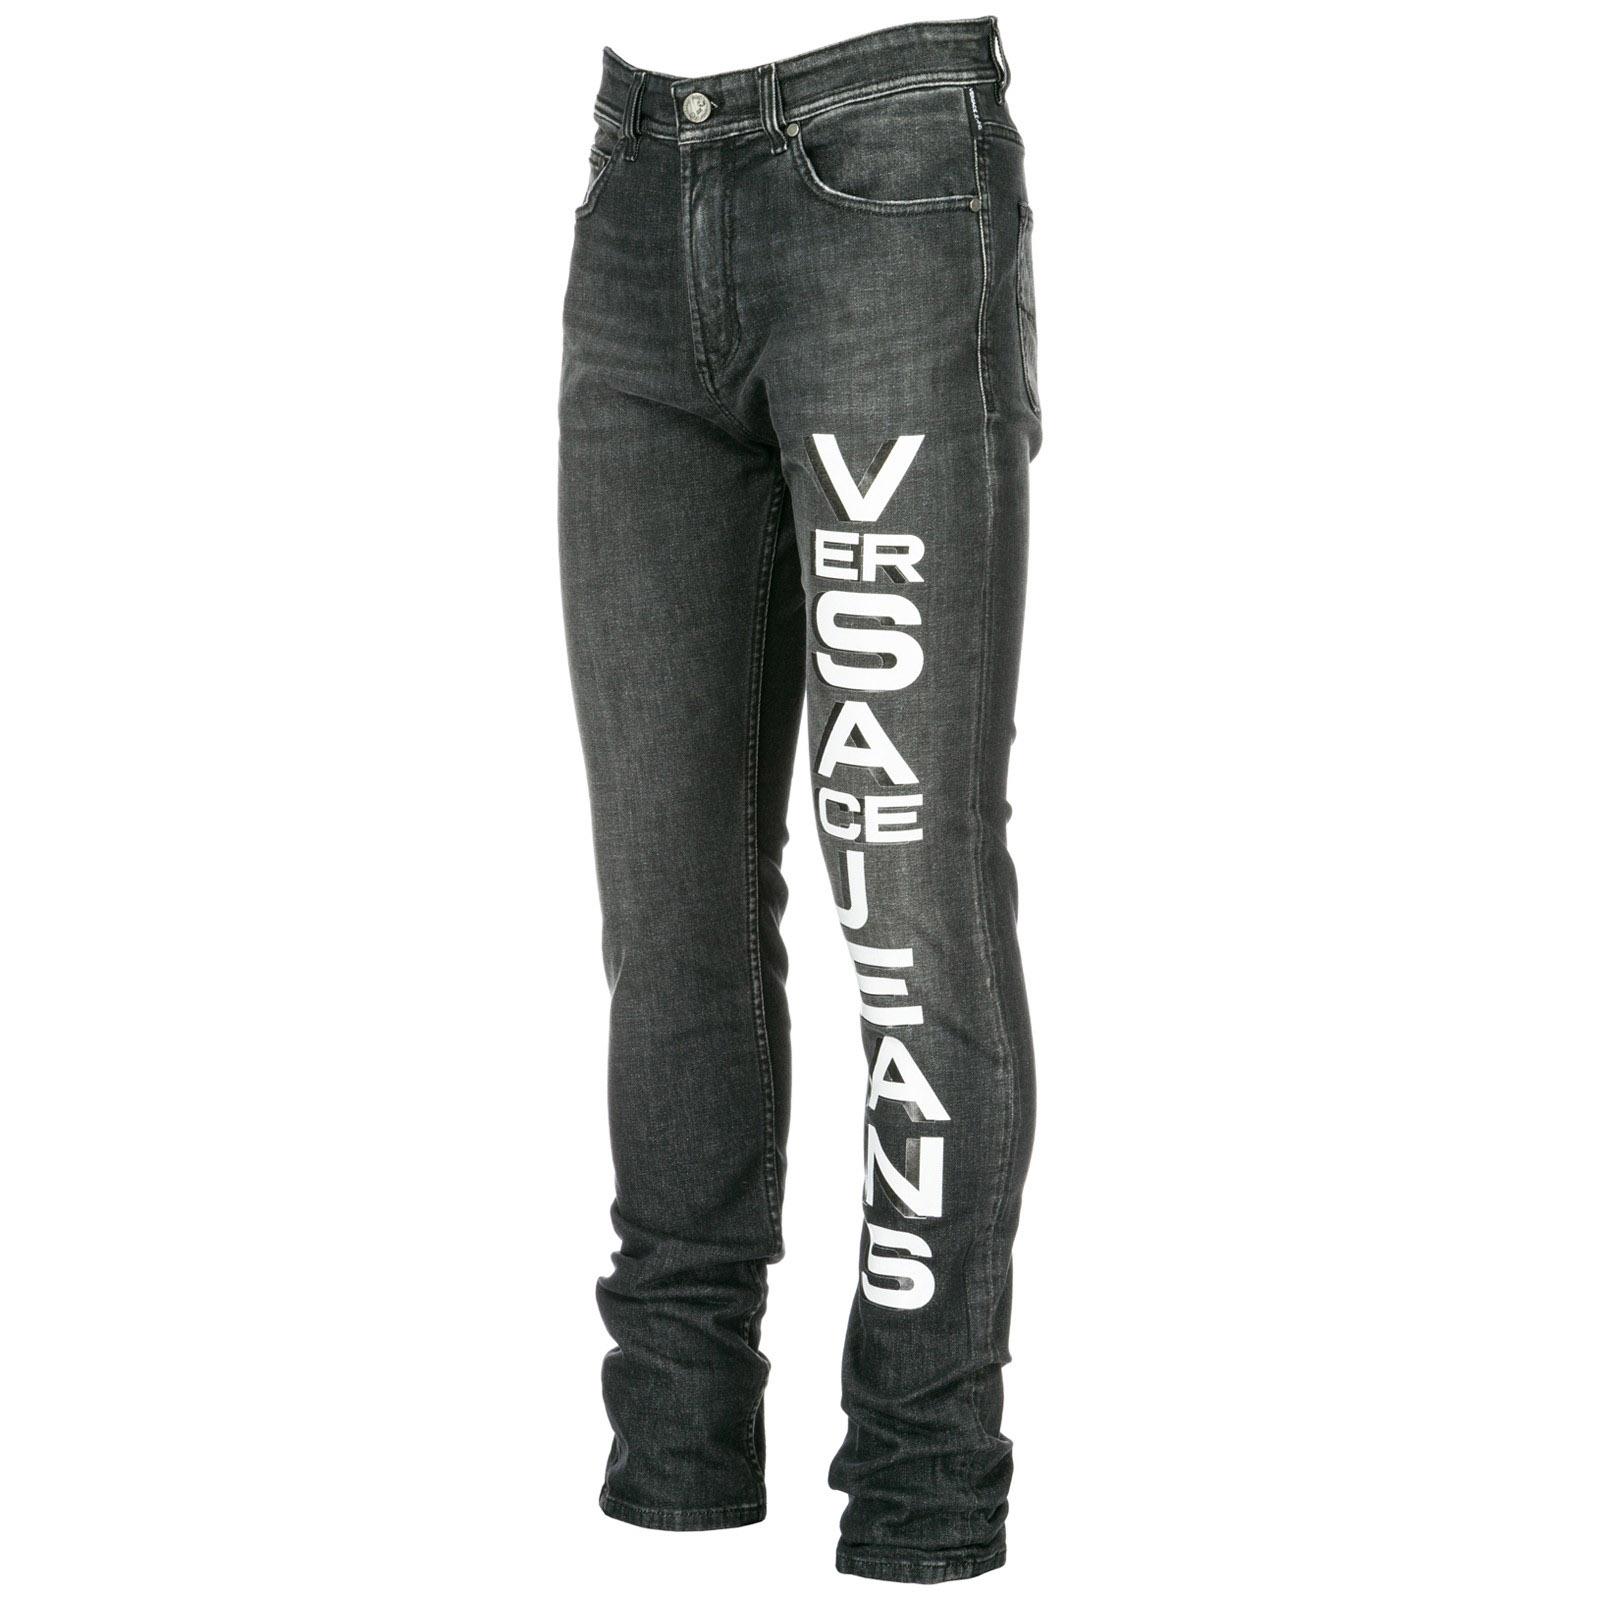 jean versace jeans a2gsb0k6 grigio. Black Bedroom Furniture Sets. Home Design Ideas